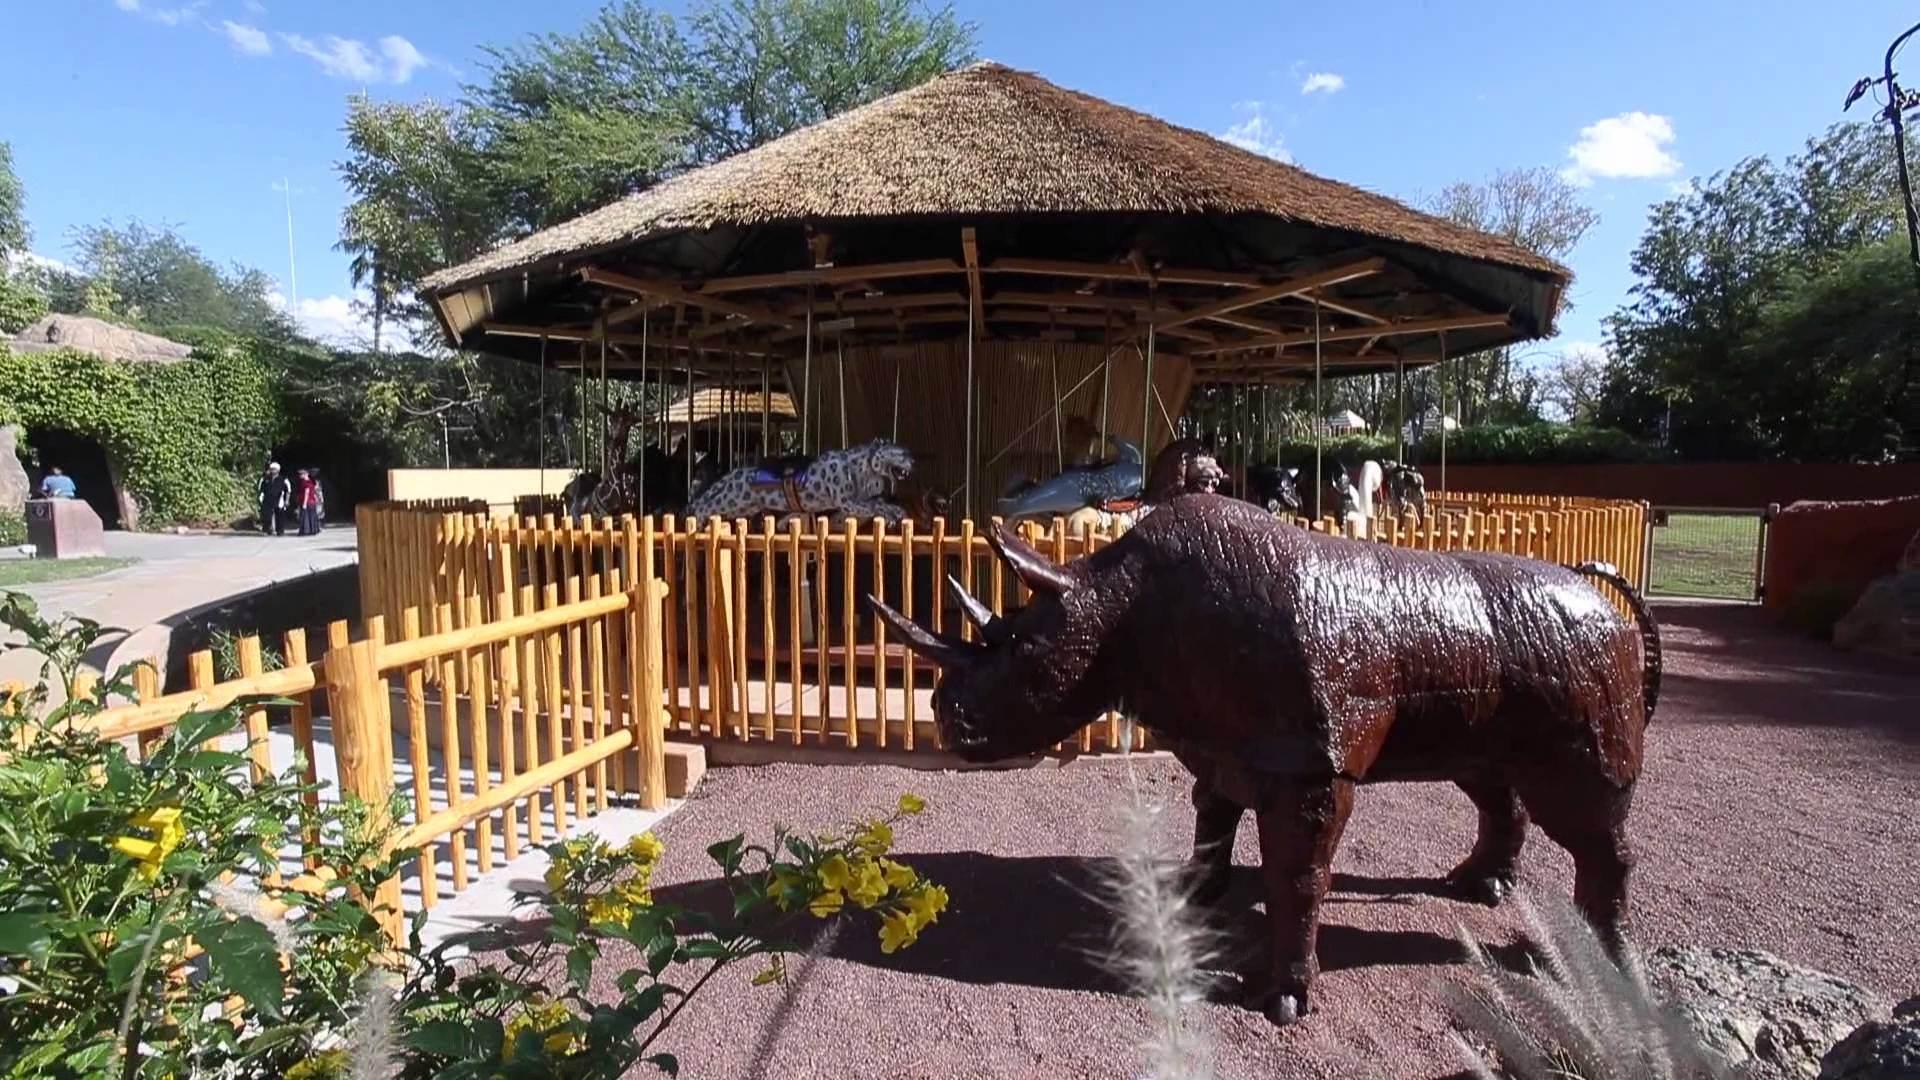 Reid Park Zoo in Tucson, AZ.